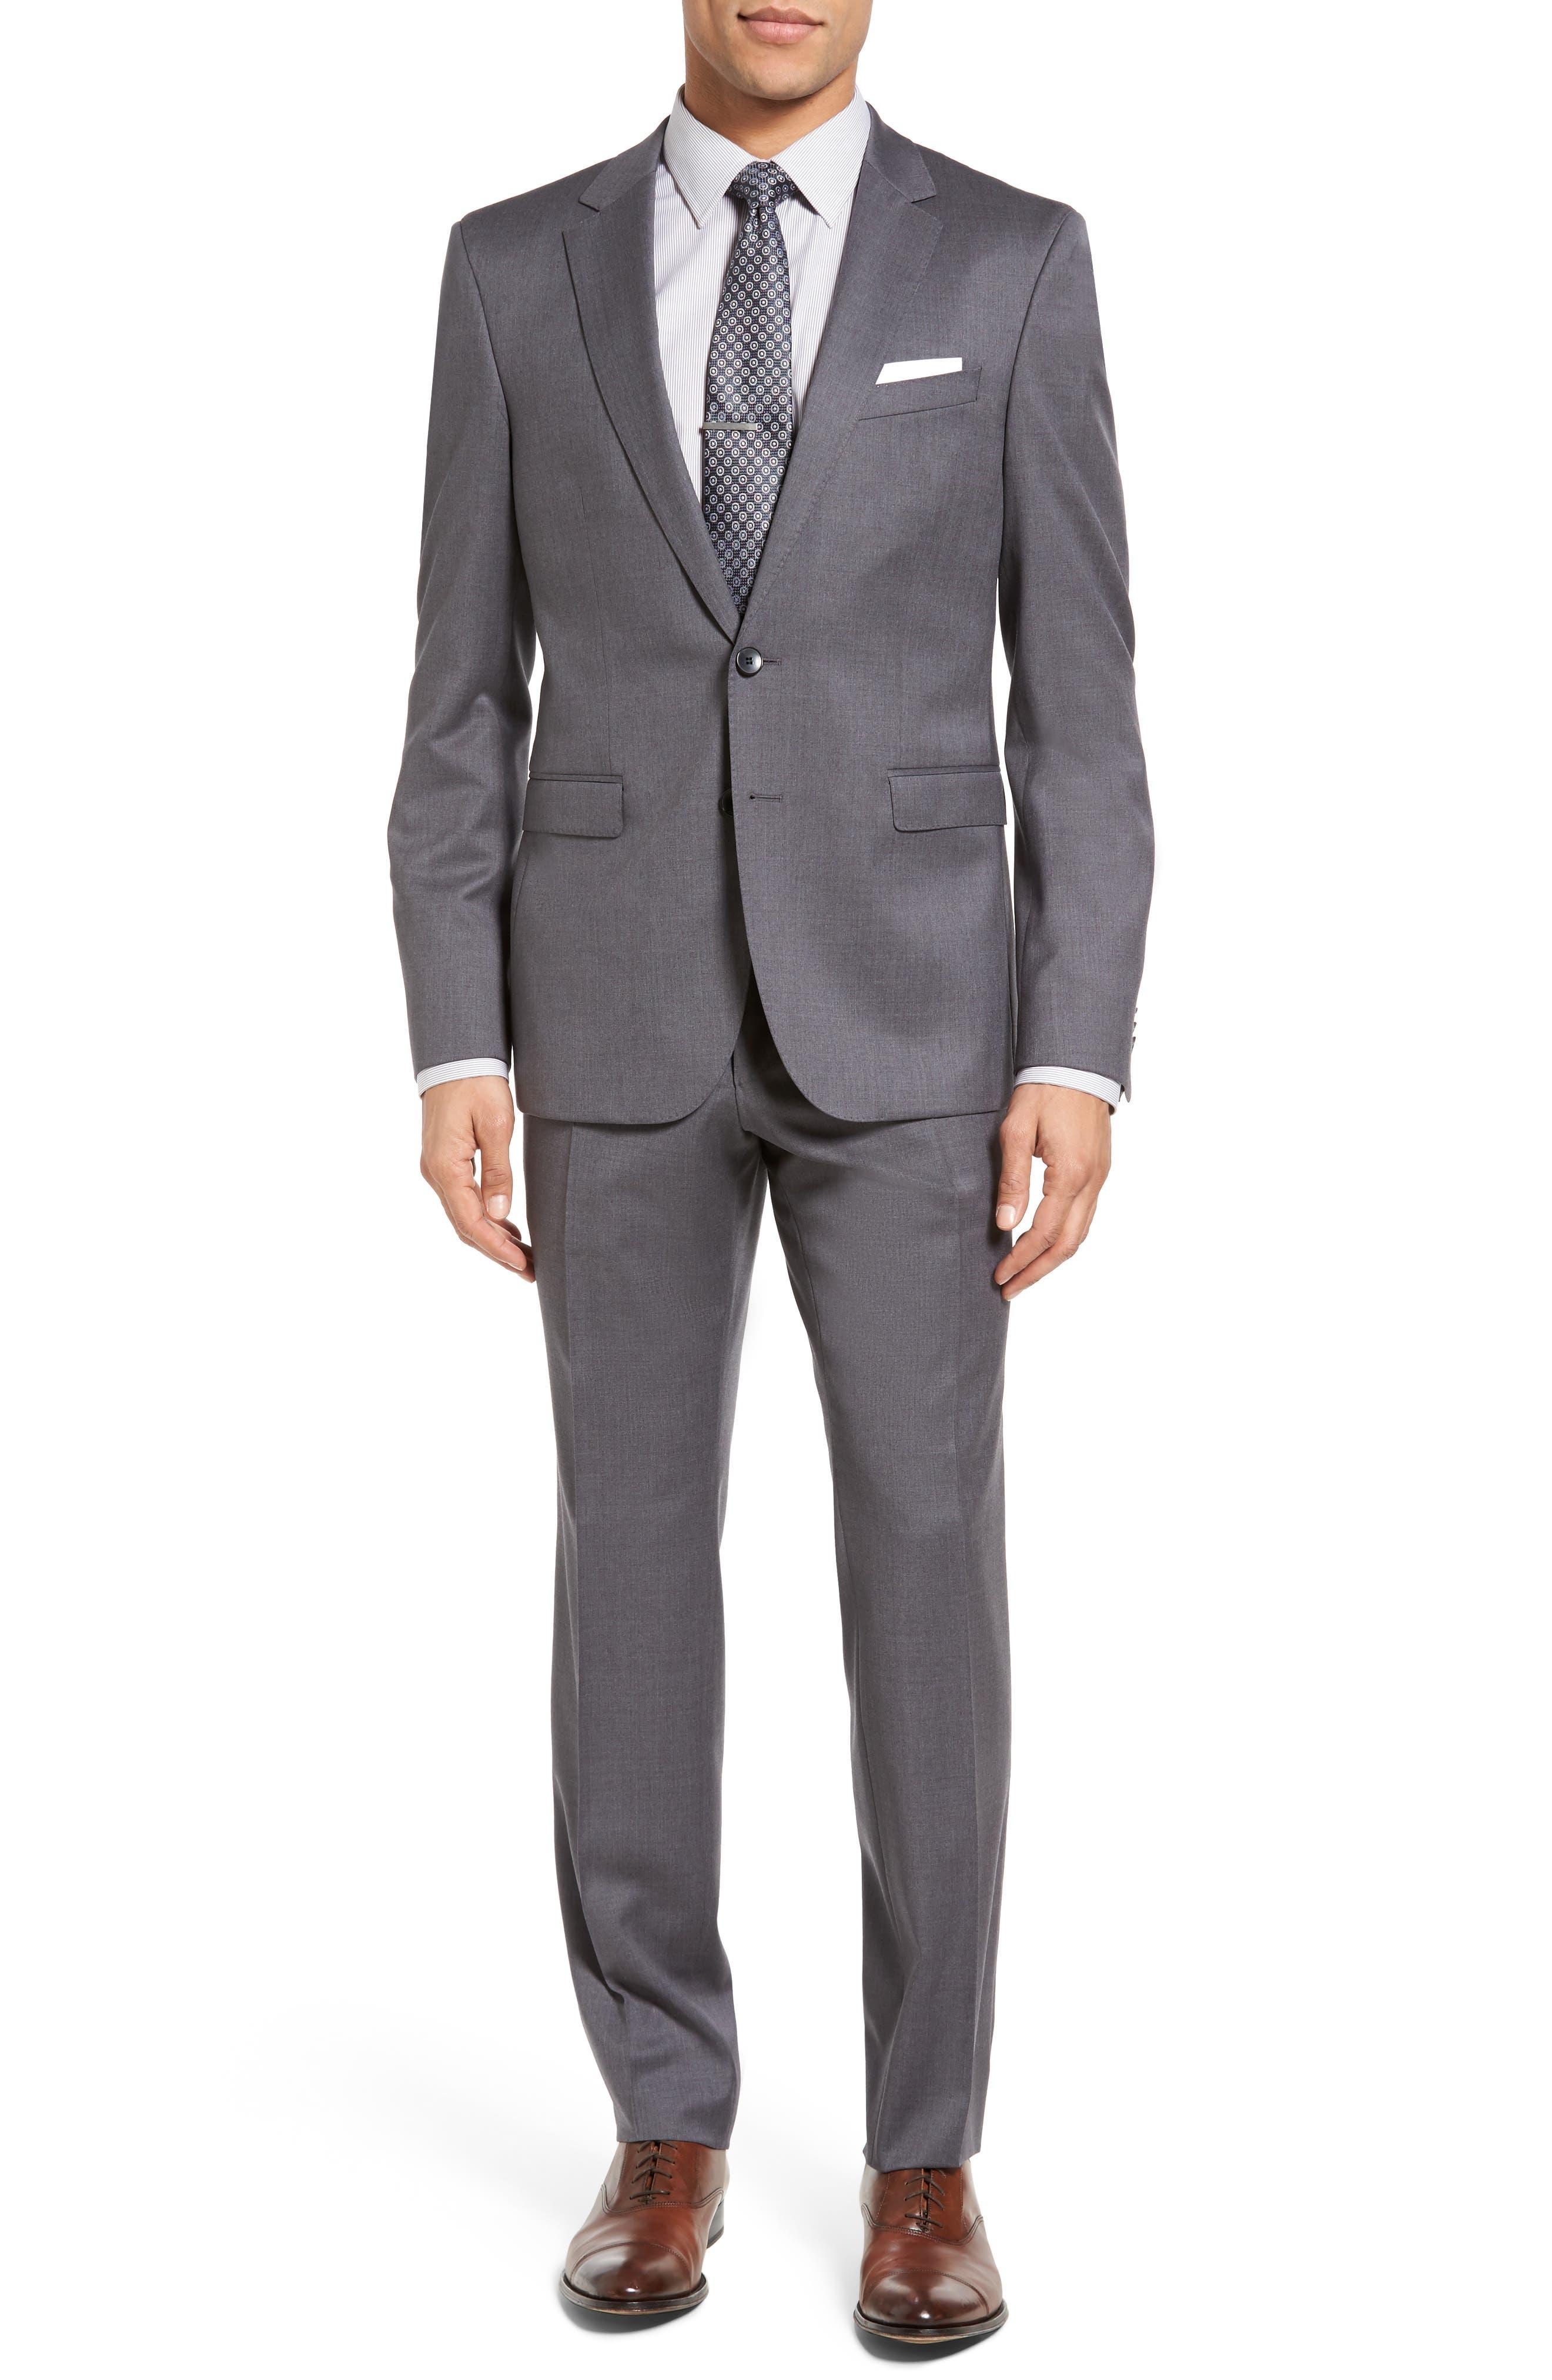 Alternate Image 1 Selected - BOSS Ryan/Win Trim Fit Solid Wool Suit